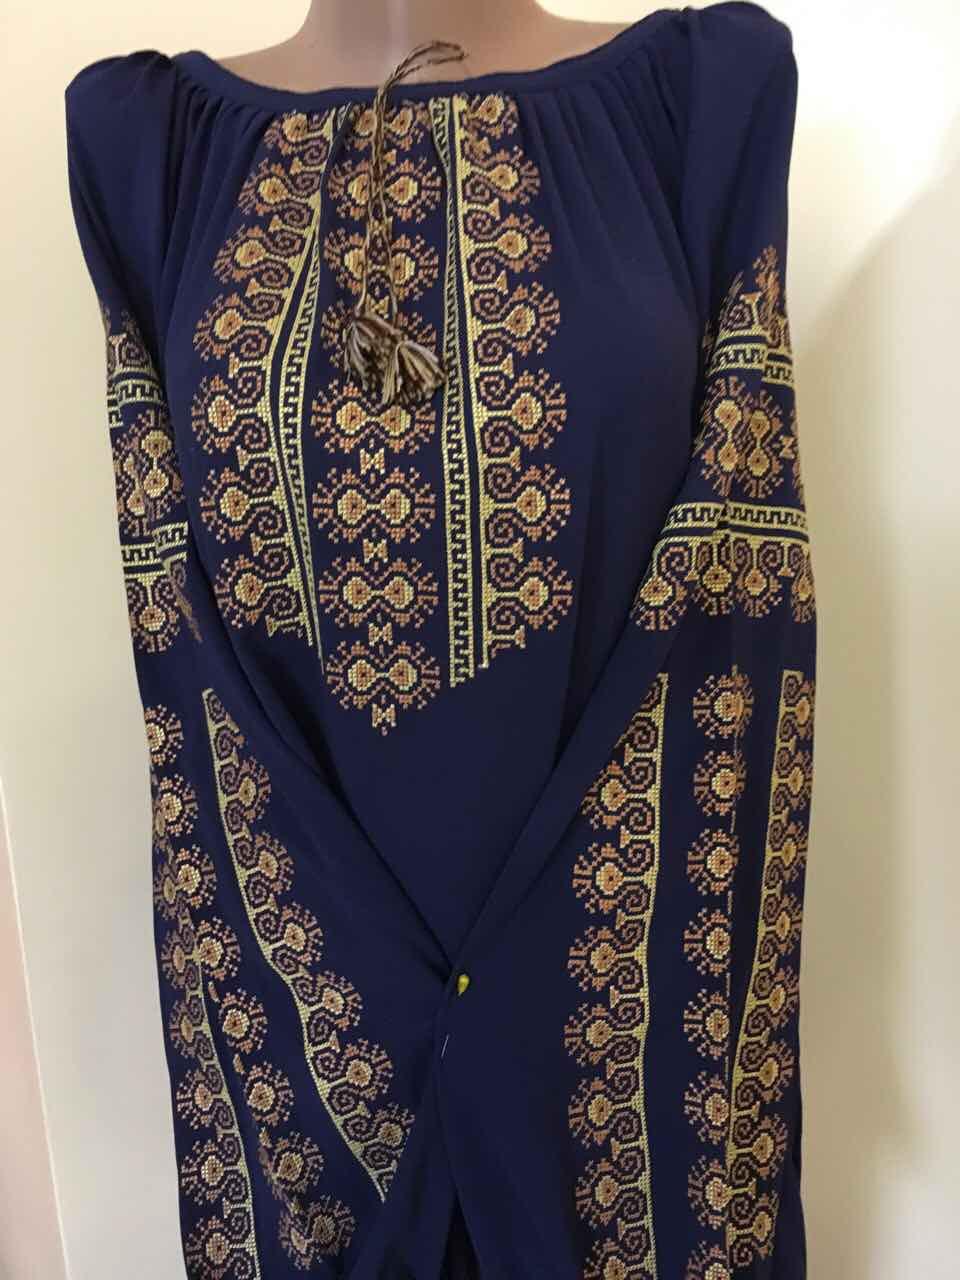 d293e133da41a6 Жіноча вишита блуза на шифоні машинна вишивка: продажа, цена в Івано ...